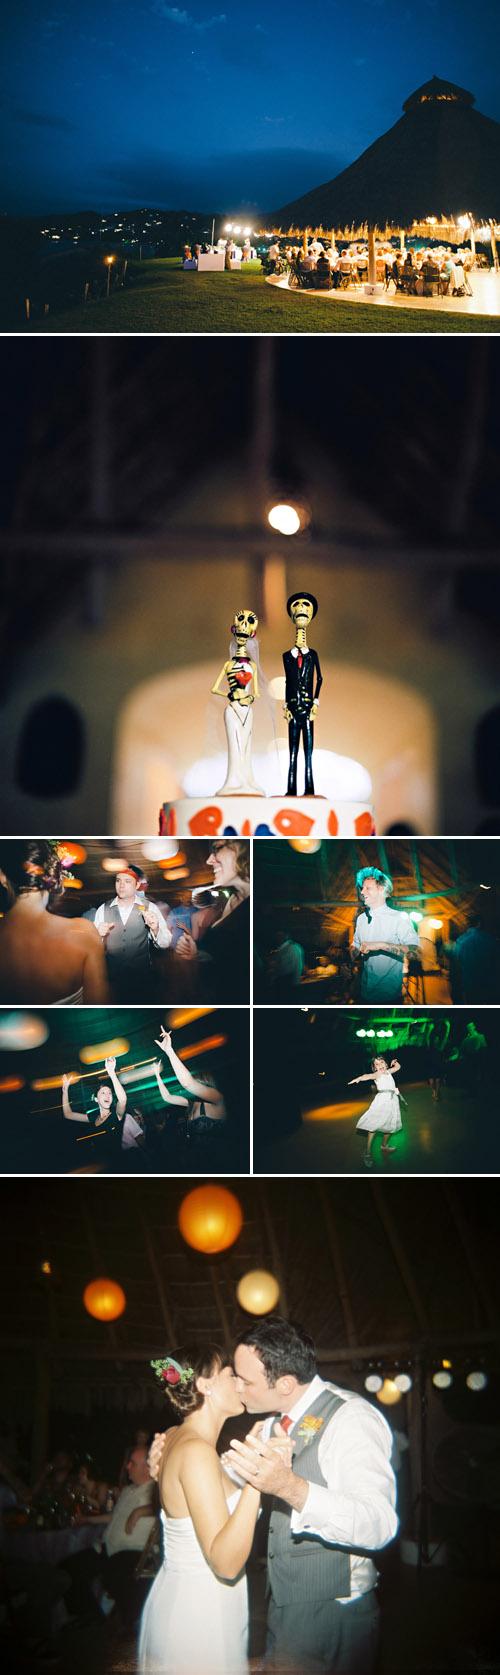 Colorful Sayulita, Mexico destination wedding, planning by Sayulita Dream Weddings, photos by Jillian Mitchell